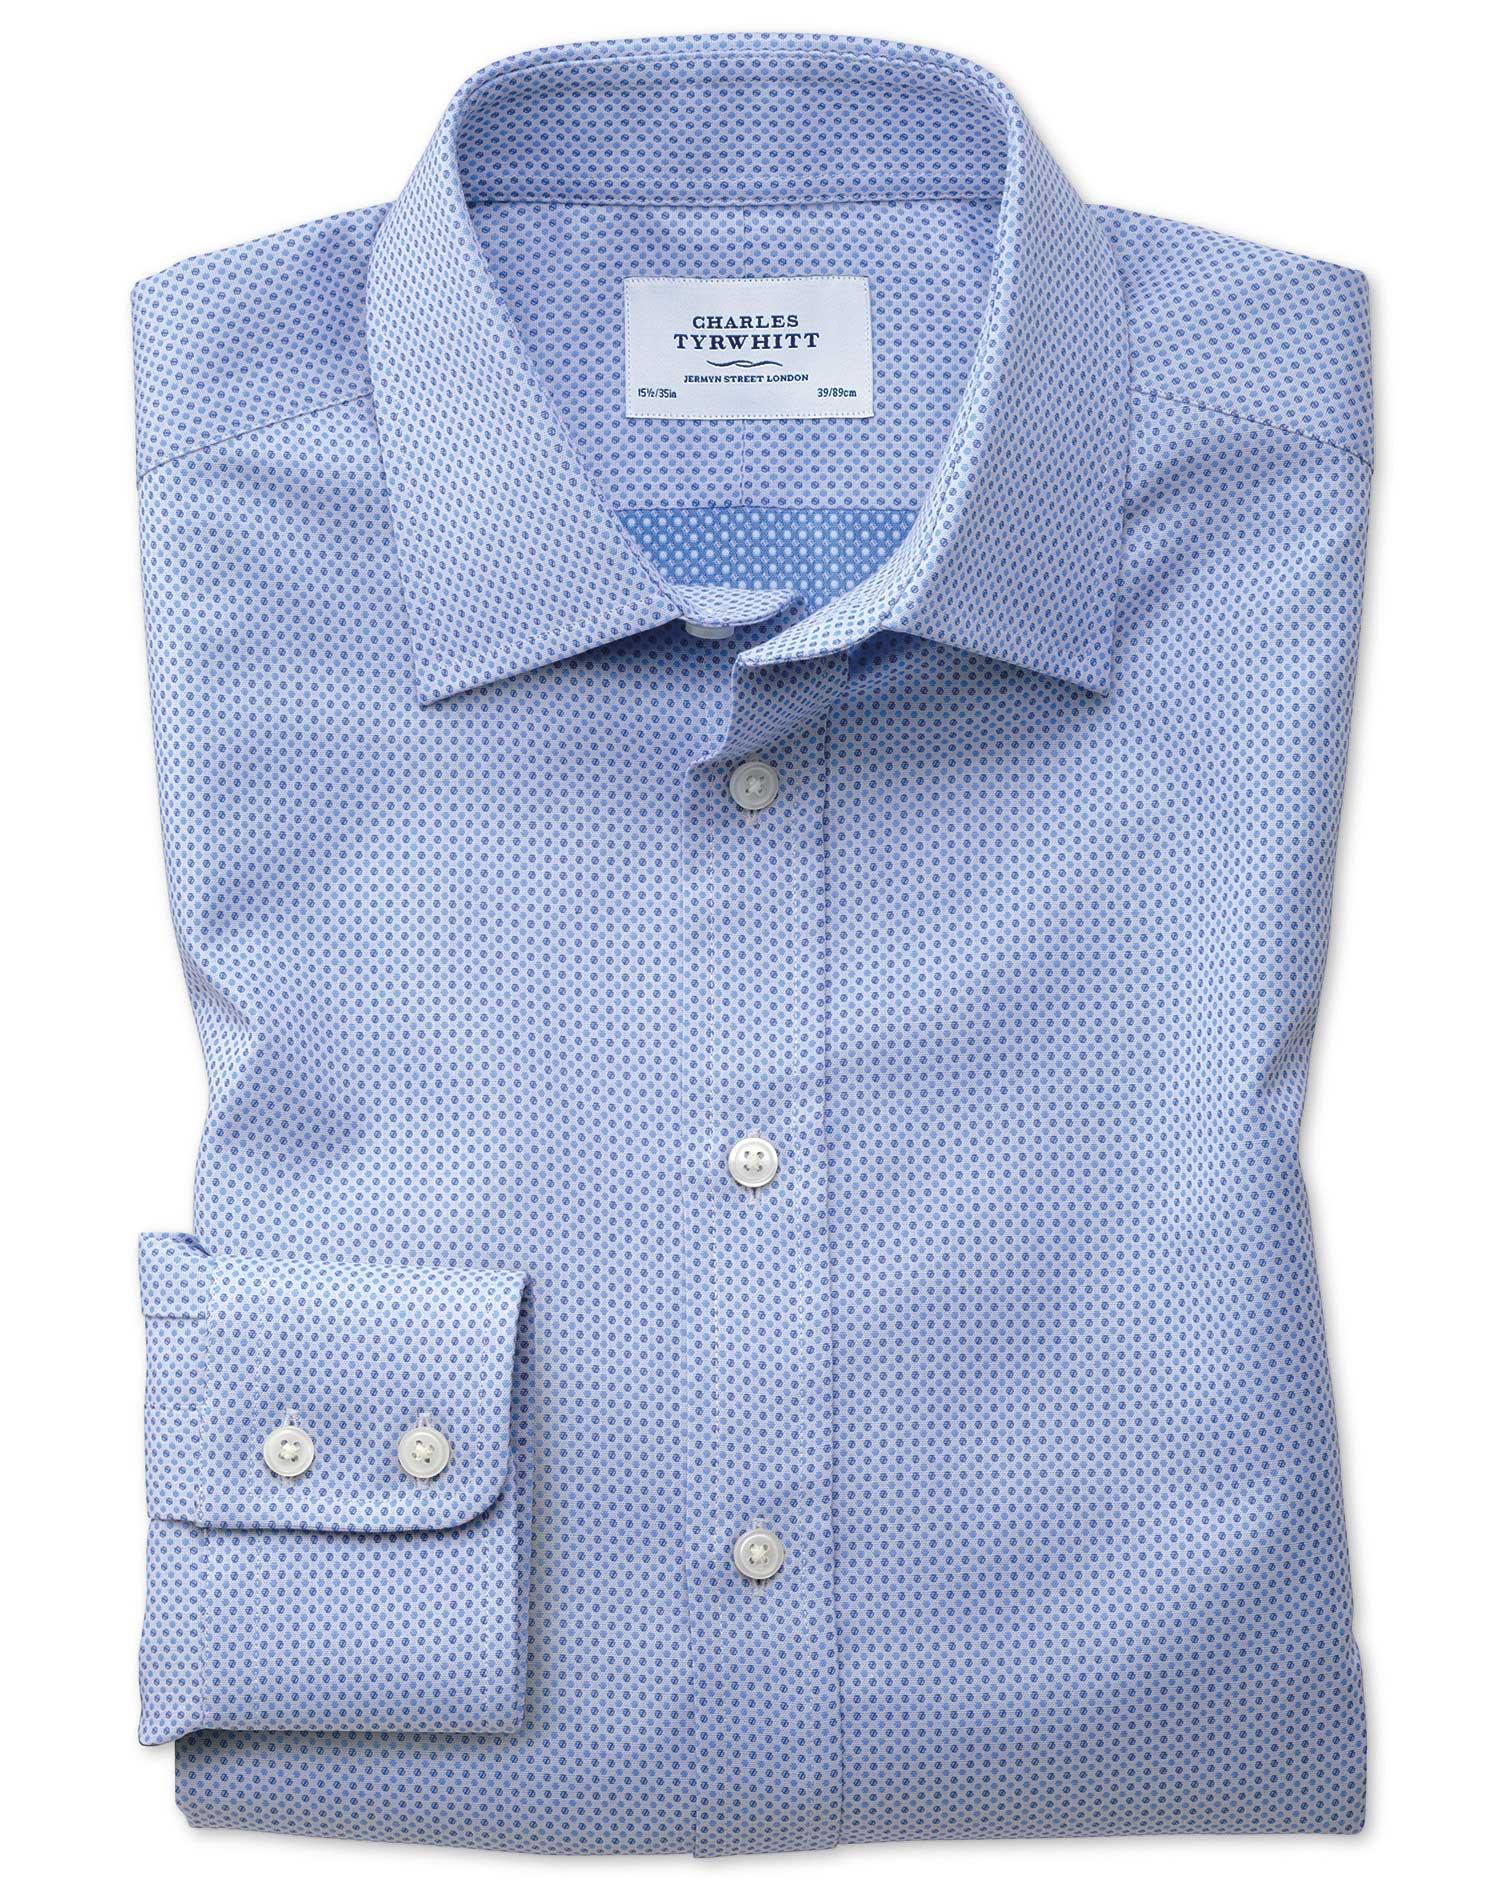 Slim Fit Egyptian Cotton Spot Weave Sky Blue Formal Shirt Single Cuff Size 15/34 by Charles Tyrwhitt